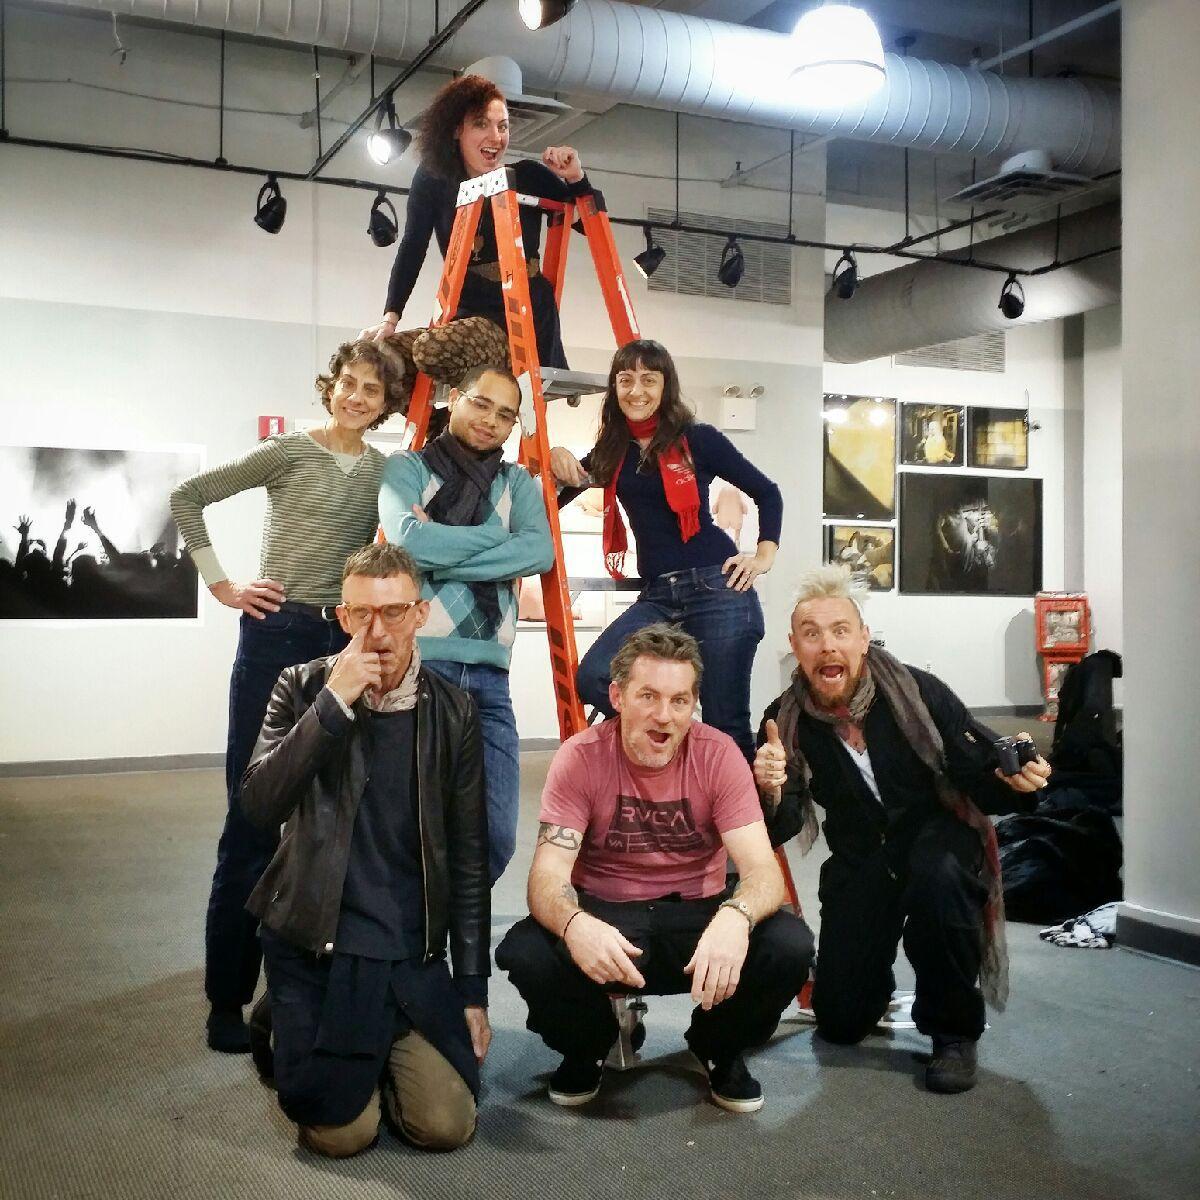 The installation crew, after a hards day work: (bottom L-R) Dragon, Derek Crew, Clay Patrick Mcbride (middle L-R) Katrin Eismann, Randhy Rodriguez, Bina Altera (top) me: Stephanie Rachel Guttenplan